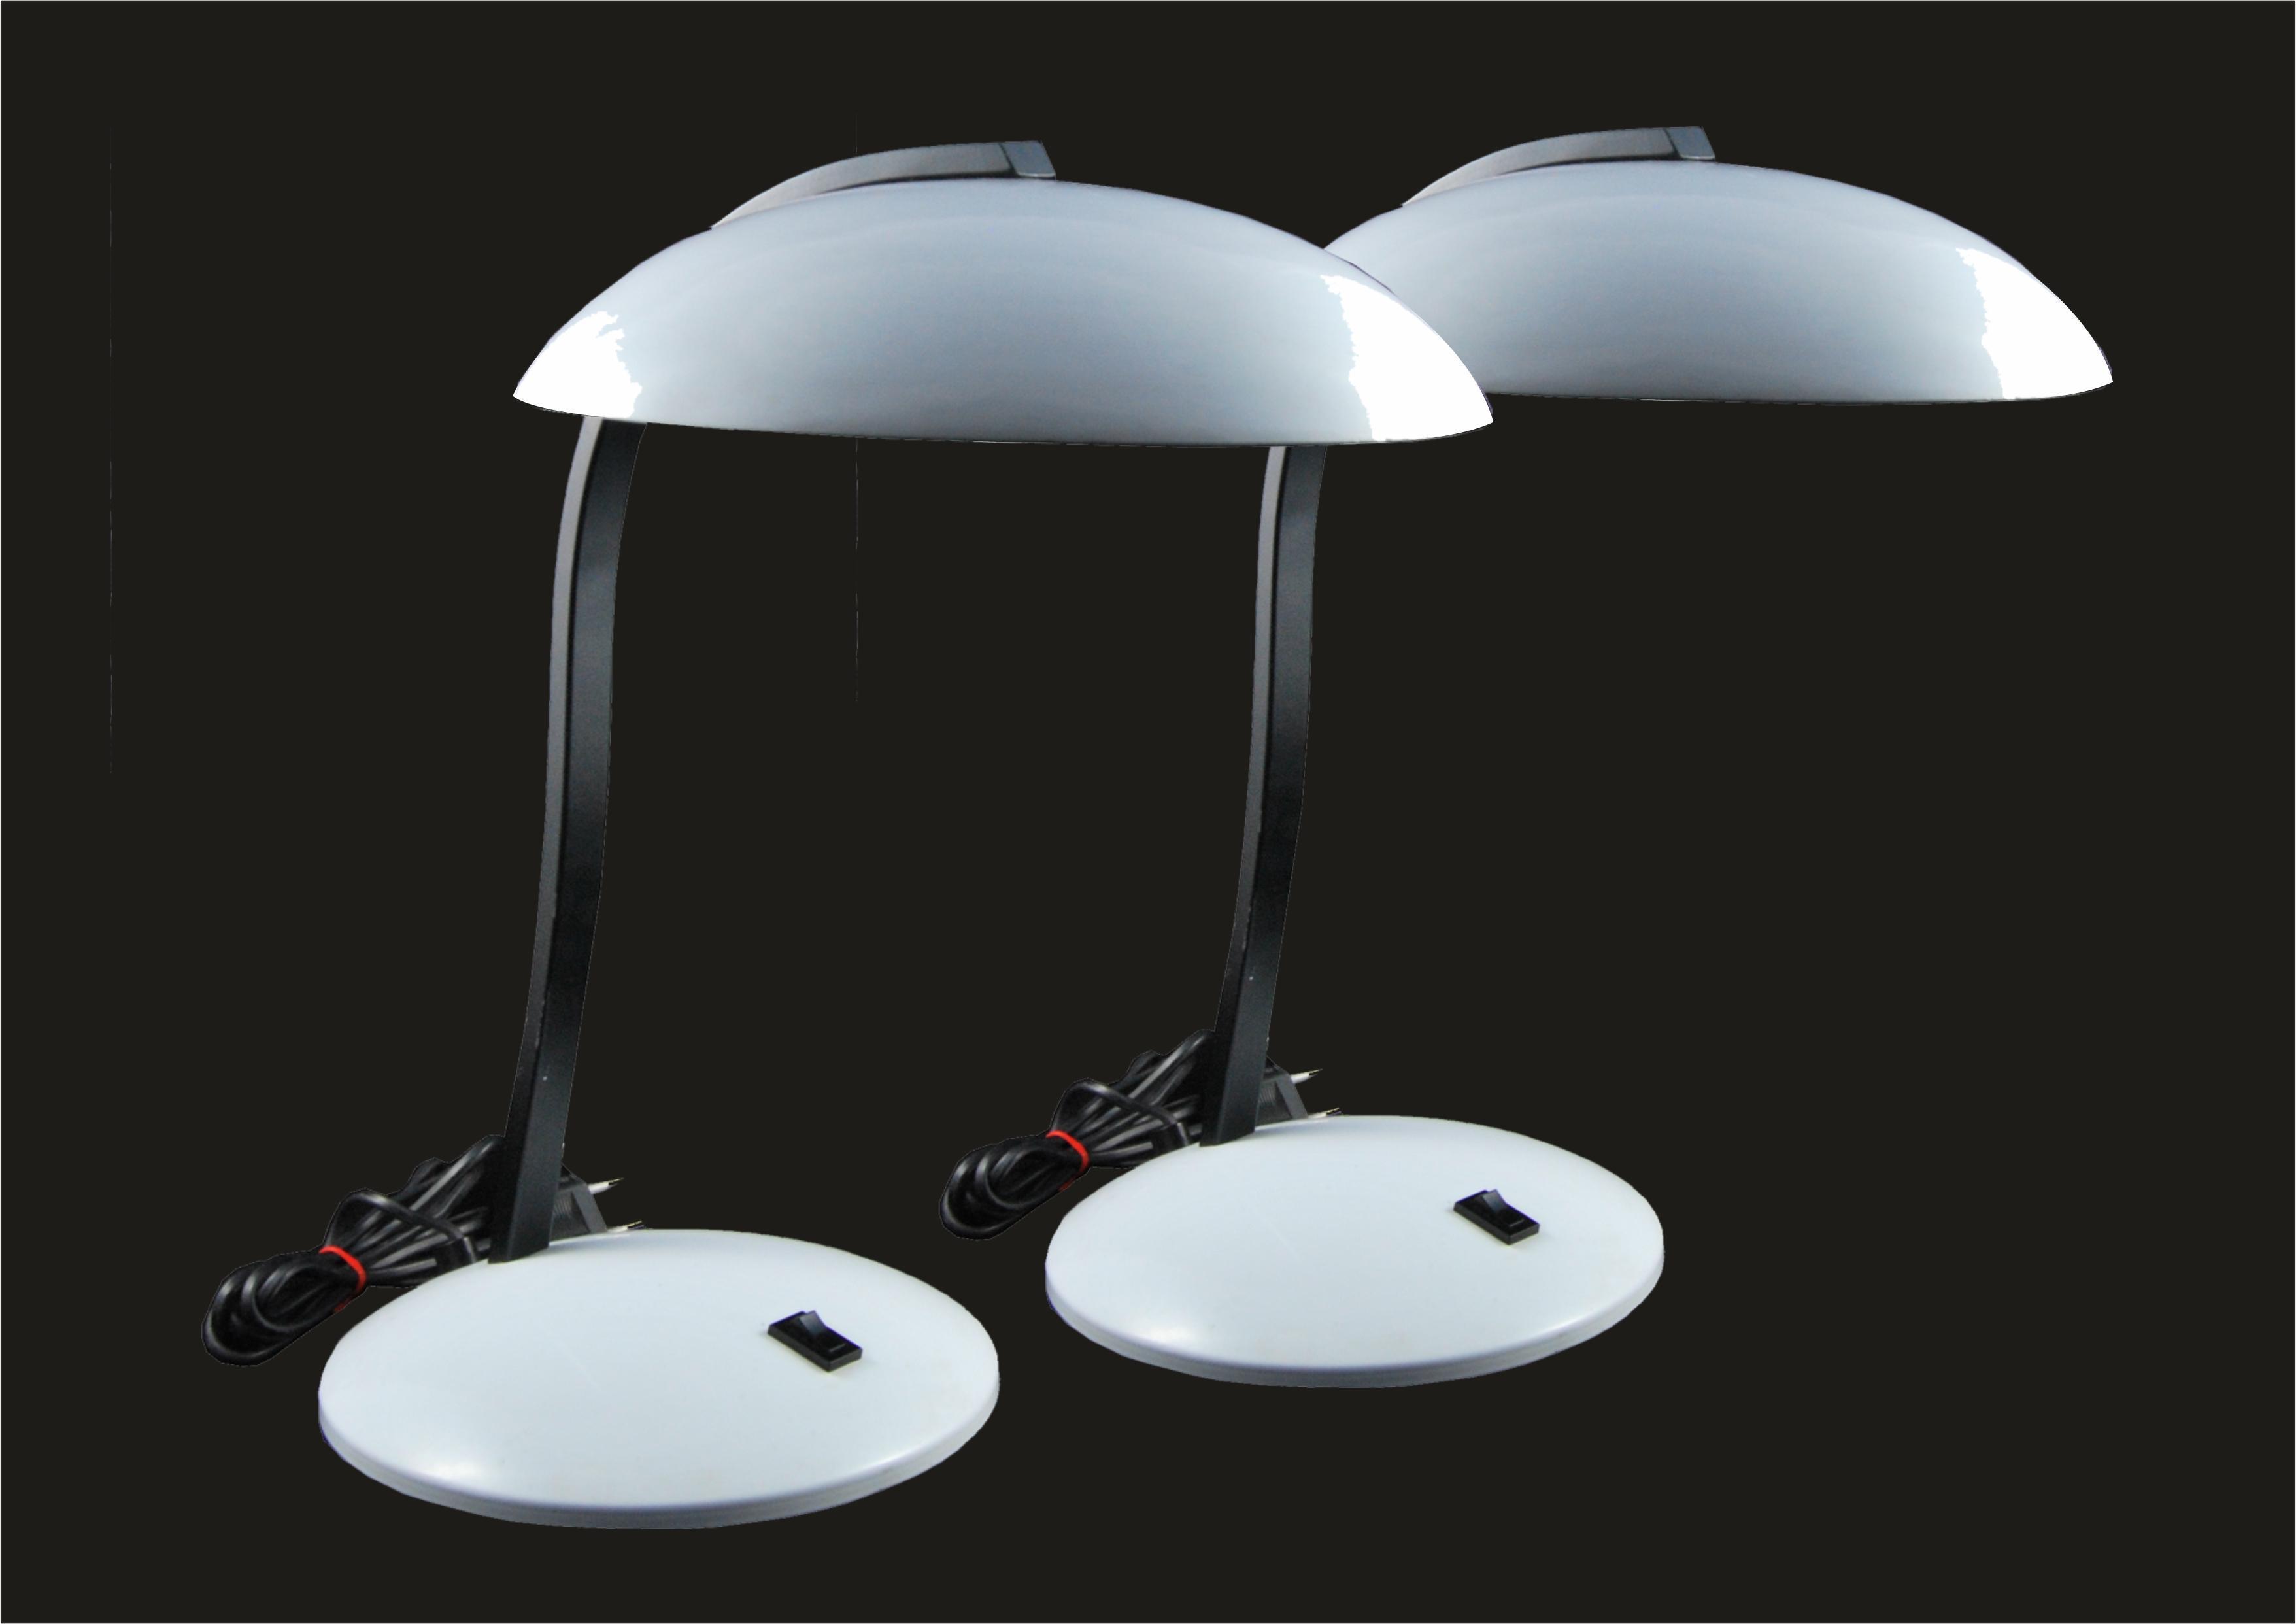 lampade modernariato nuova veneta